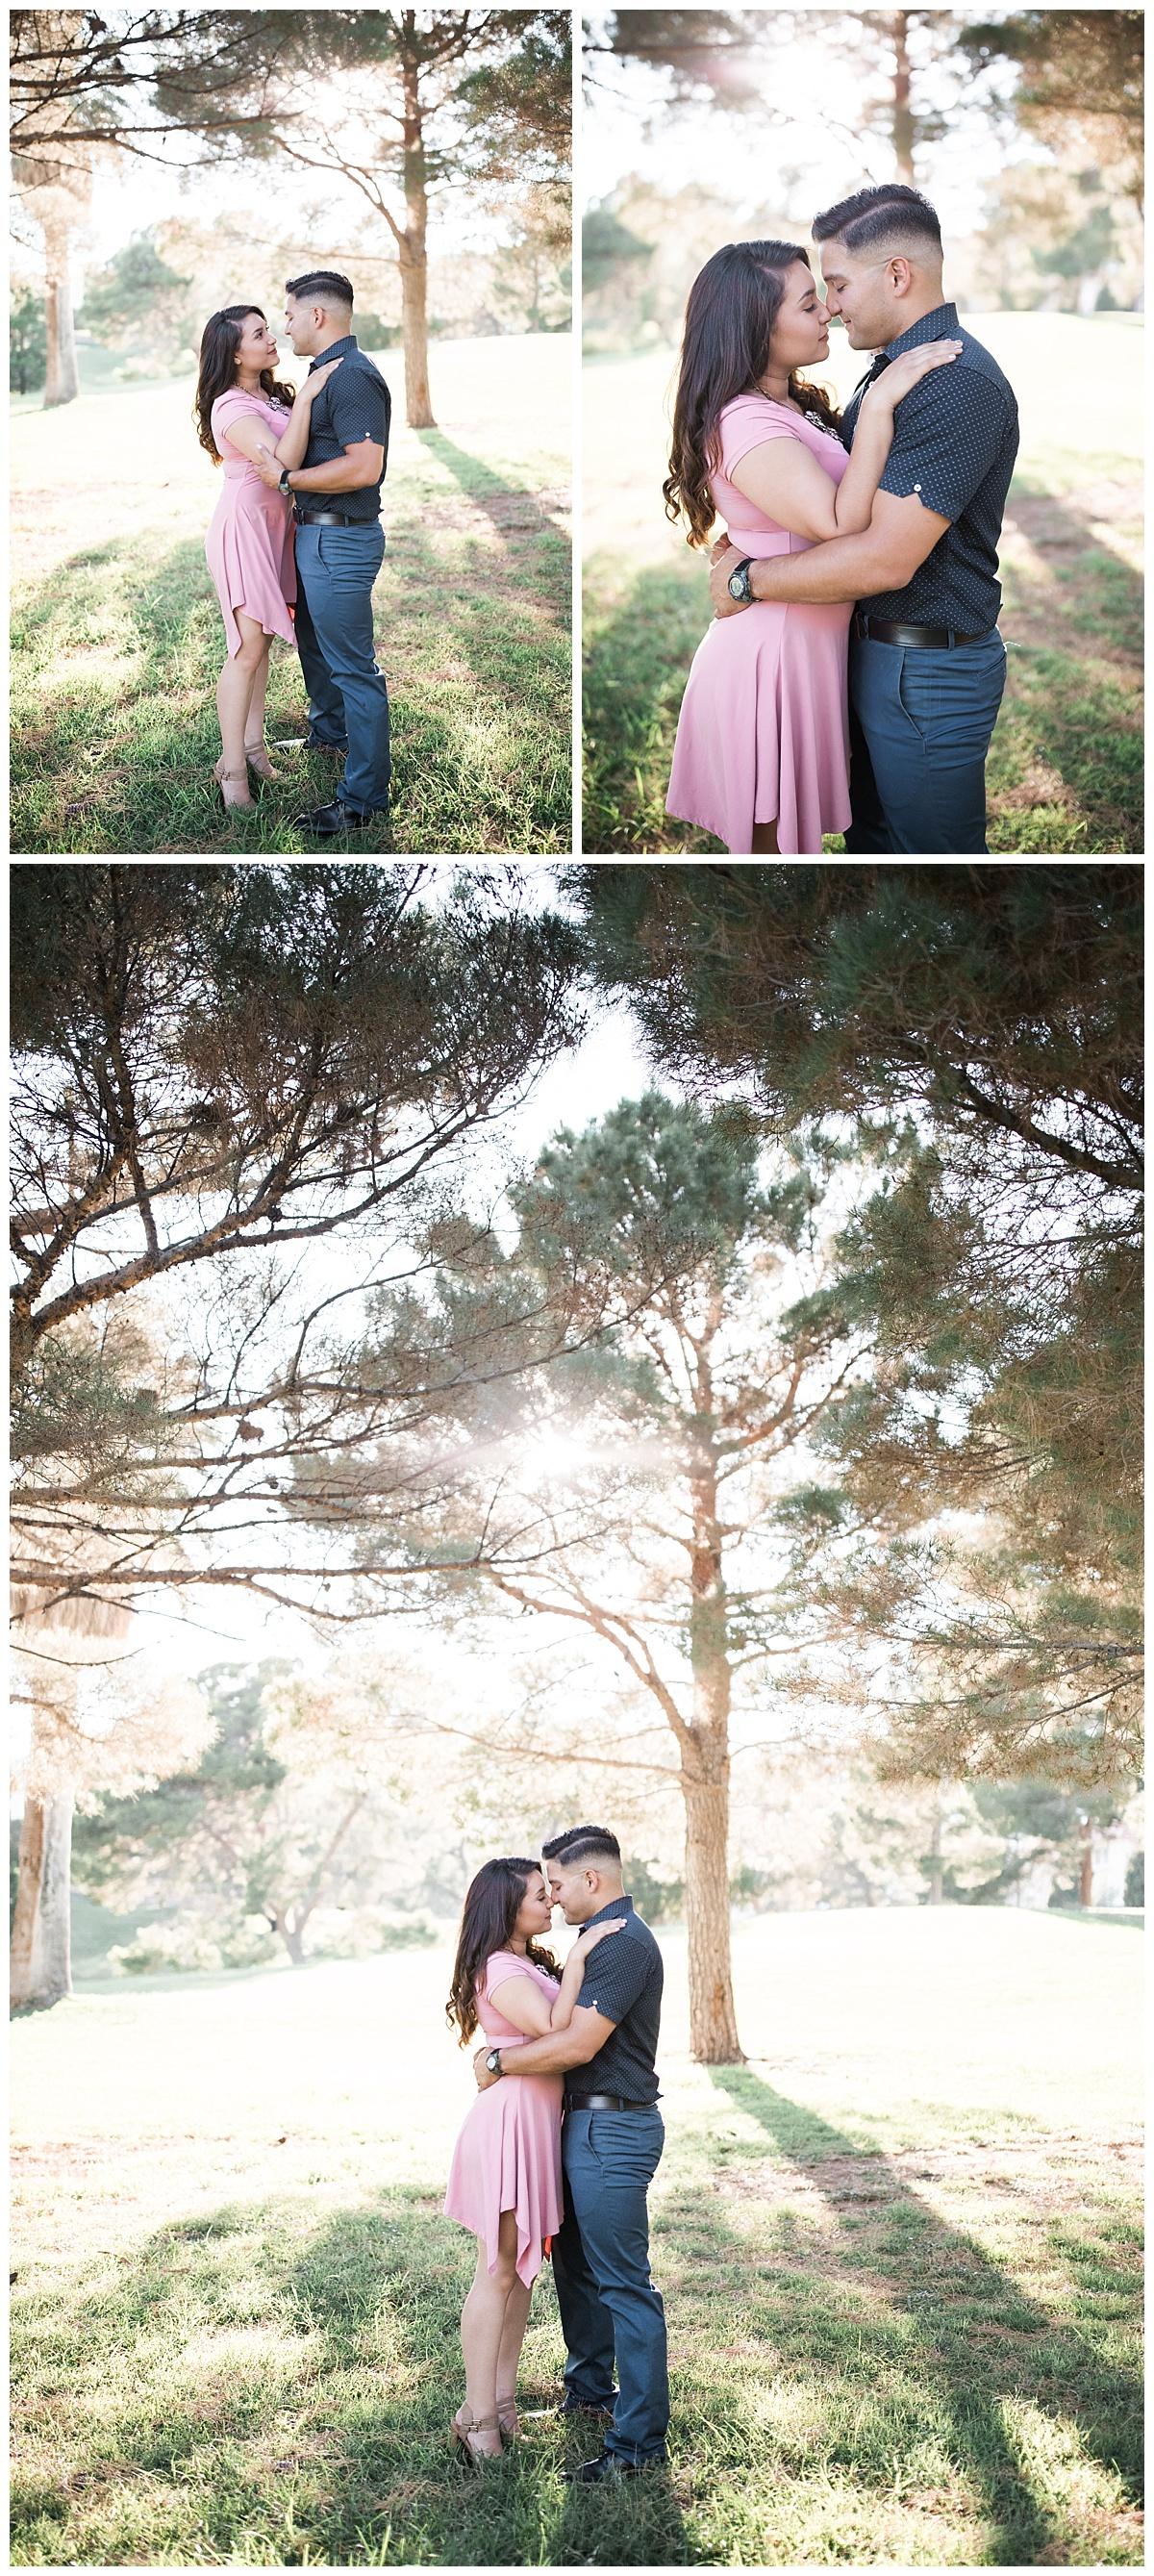 el paso engagement photography, el paso wedding photography